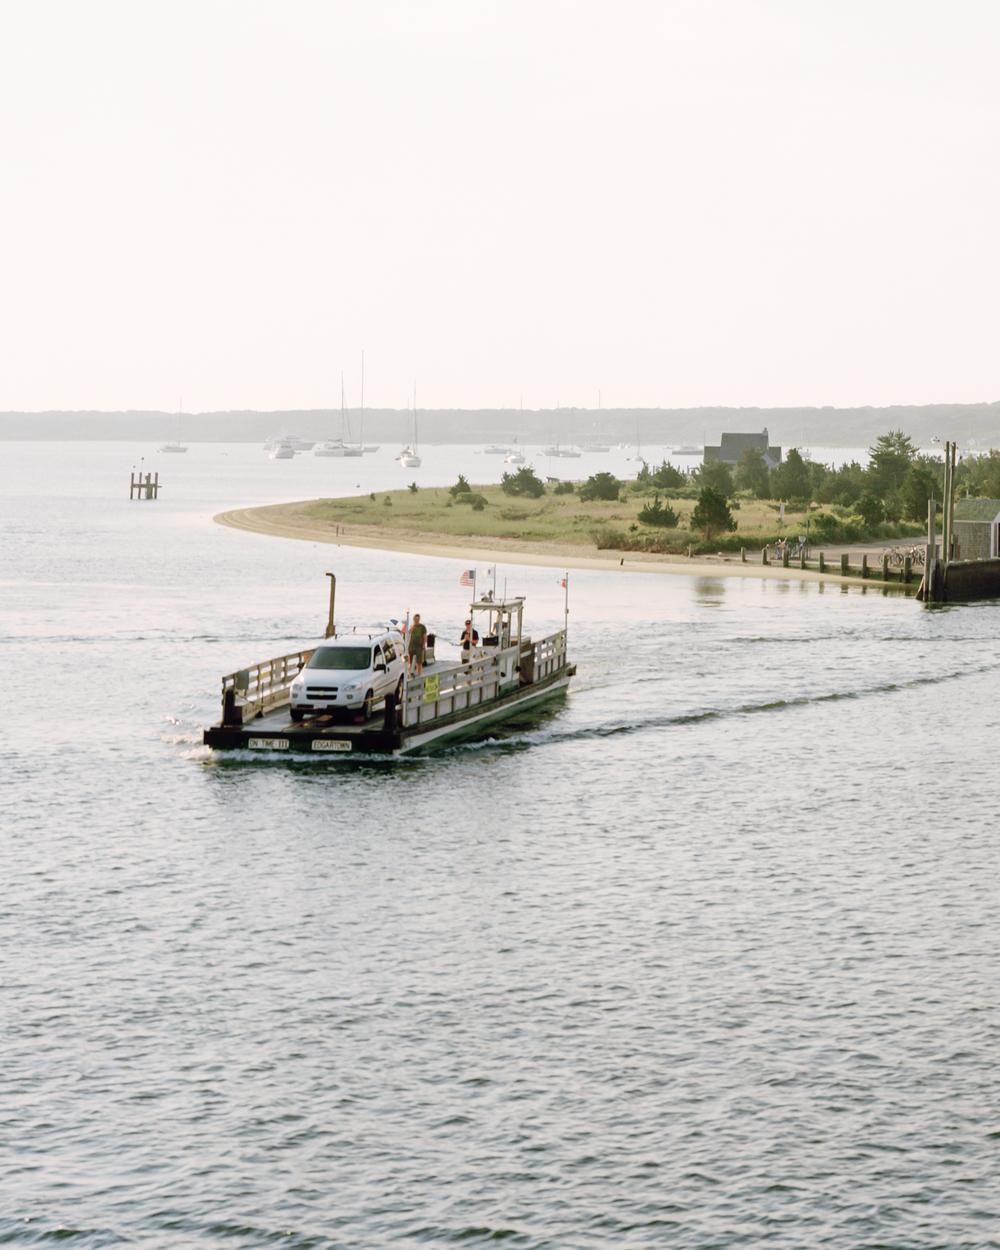 003 chappy ferry cropped.jpg